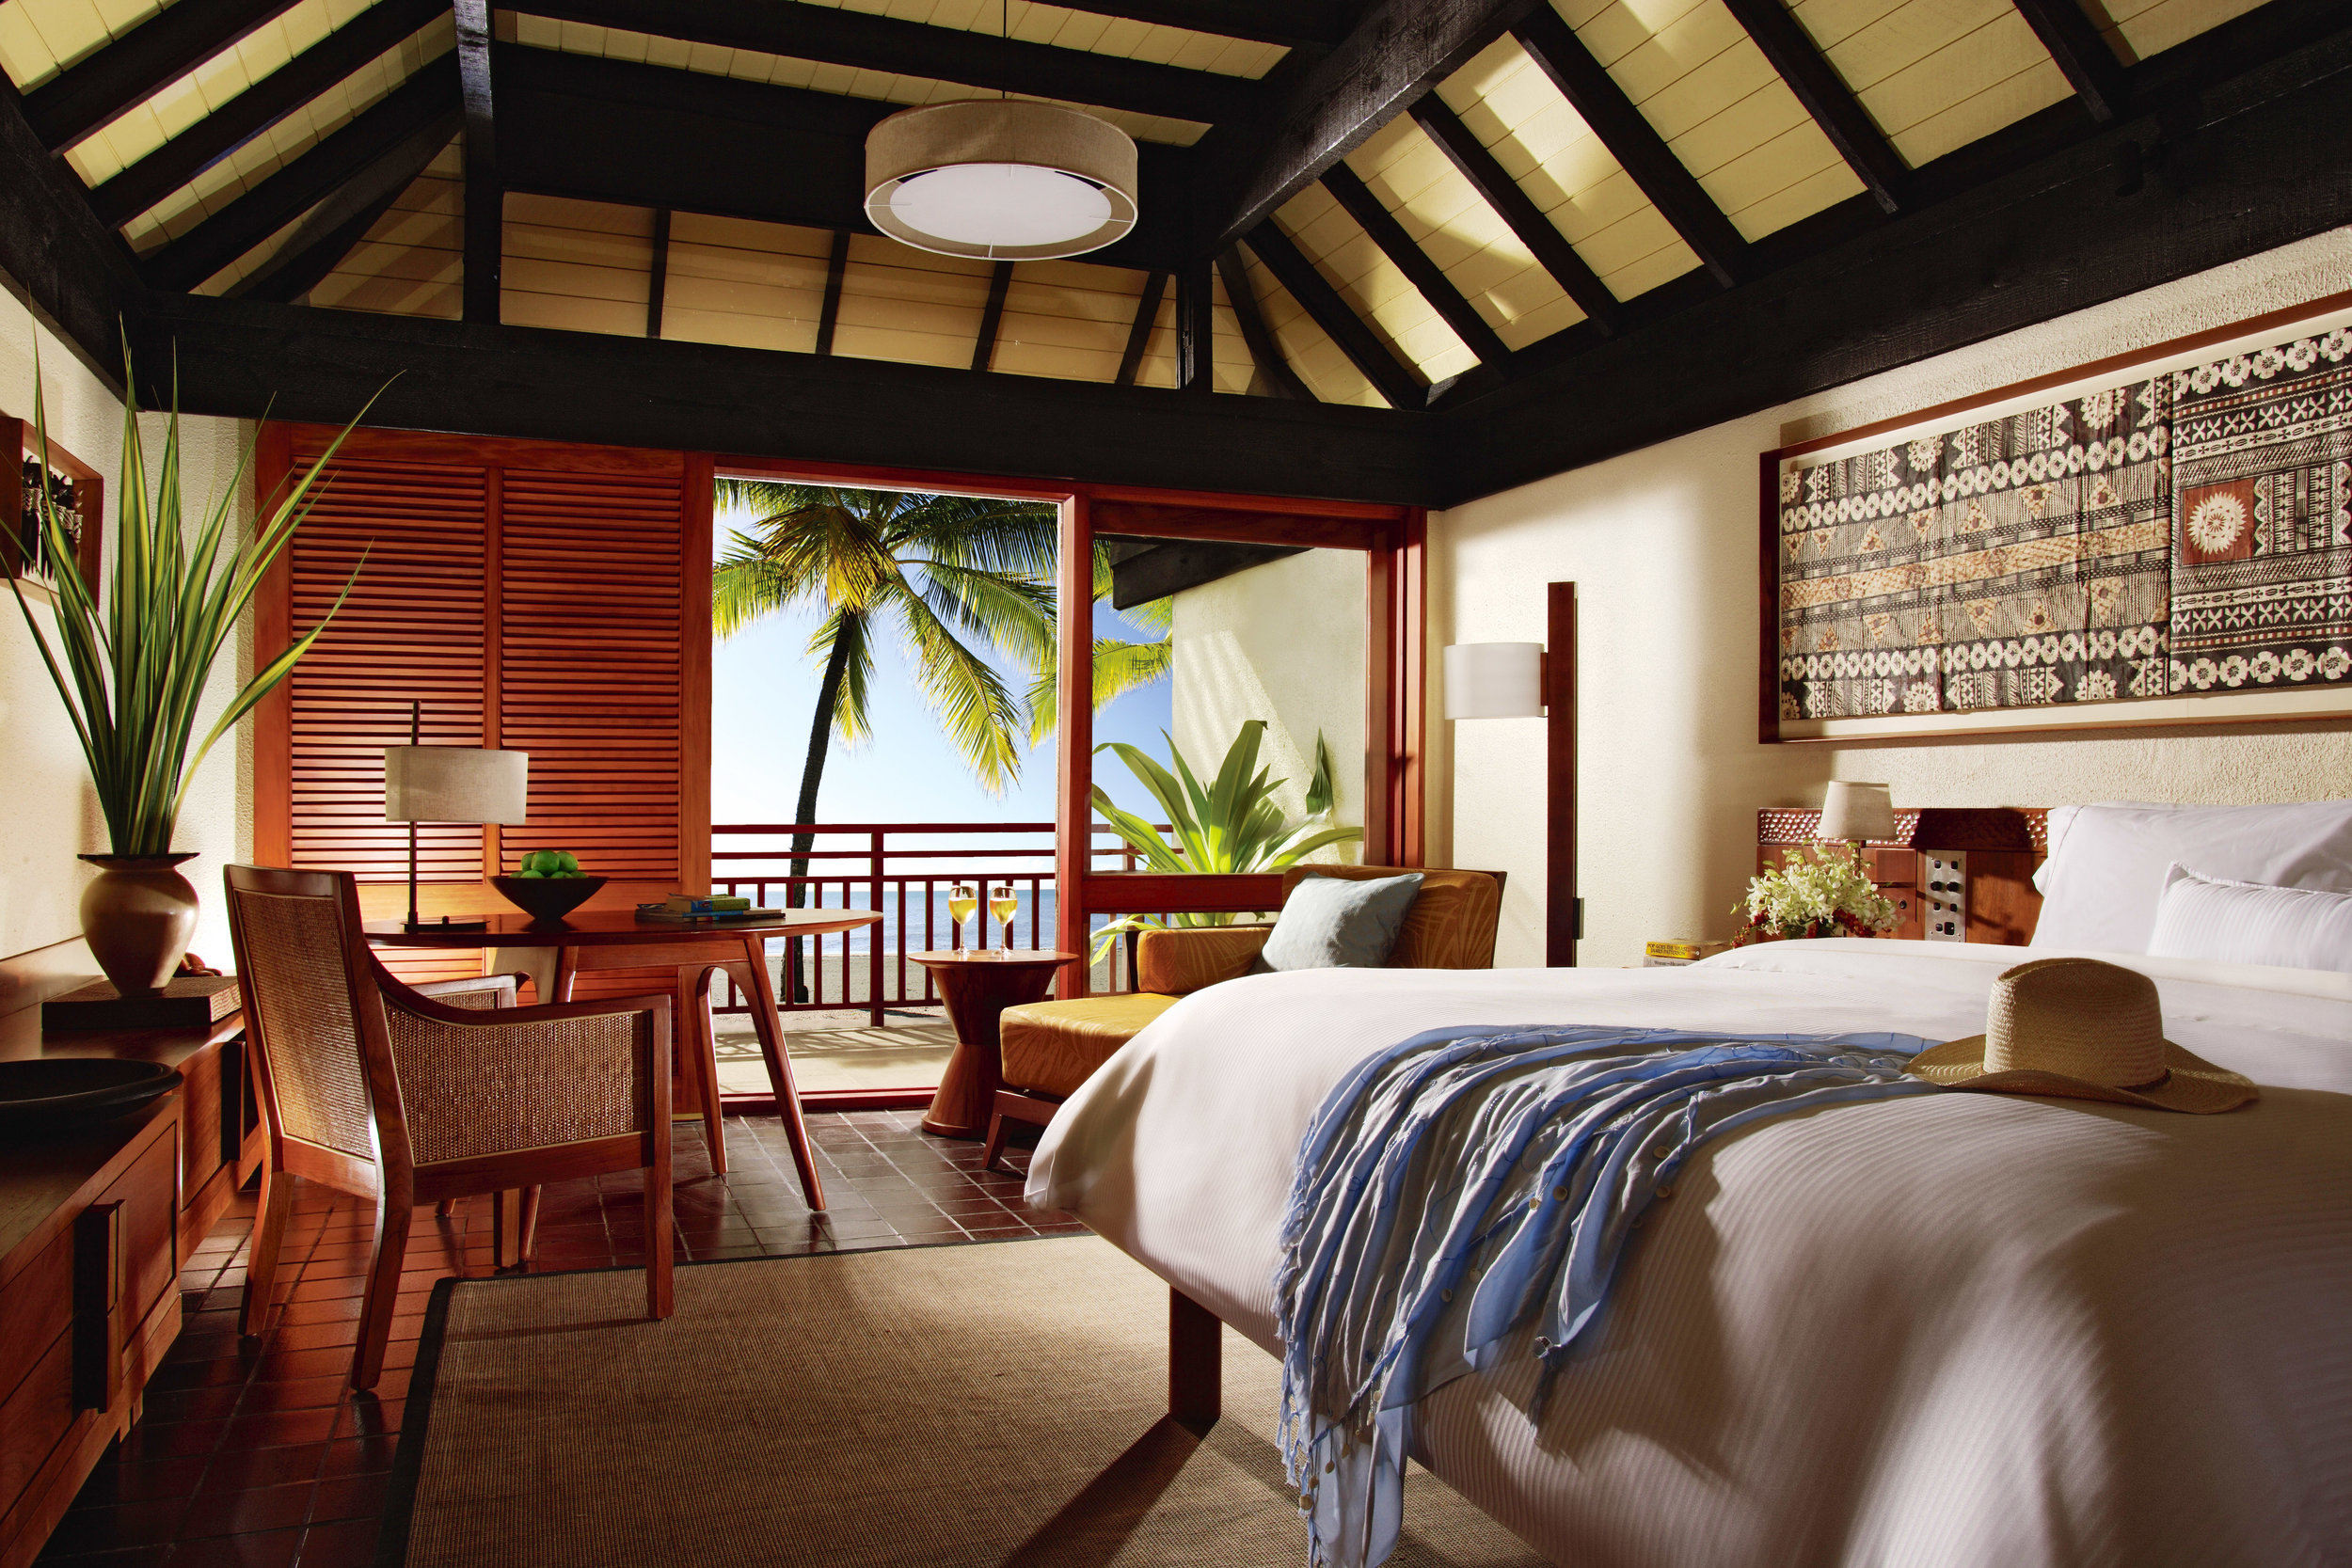 Westin-Denarau-Island-Resort-and-Spa-Fiji5787x3858.jpg